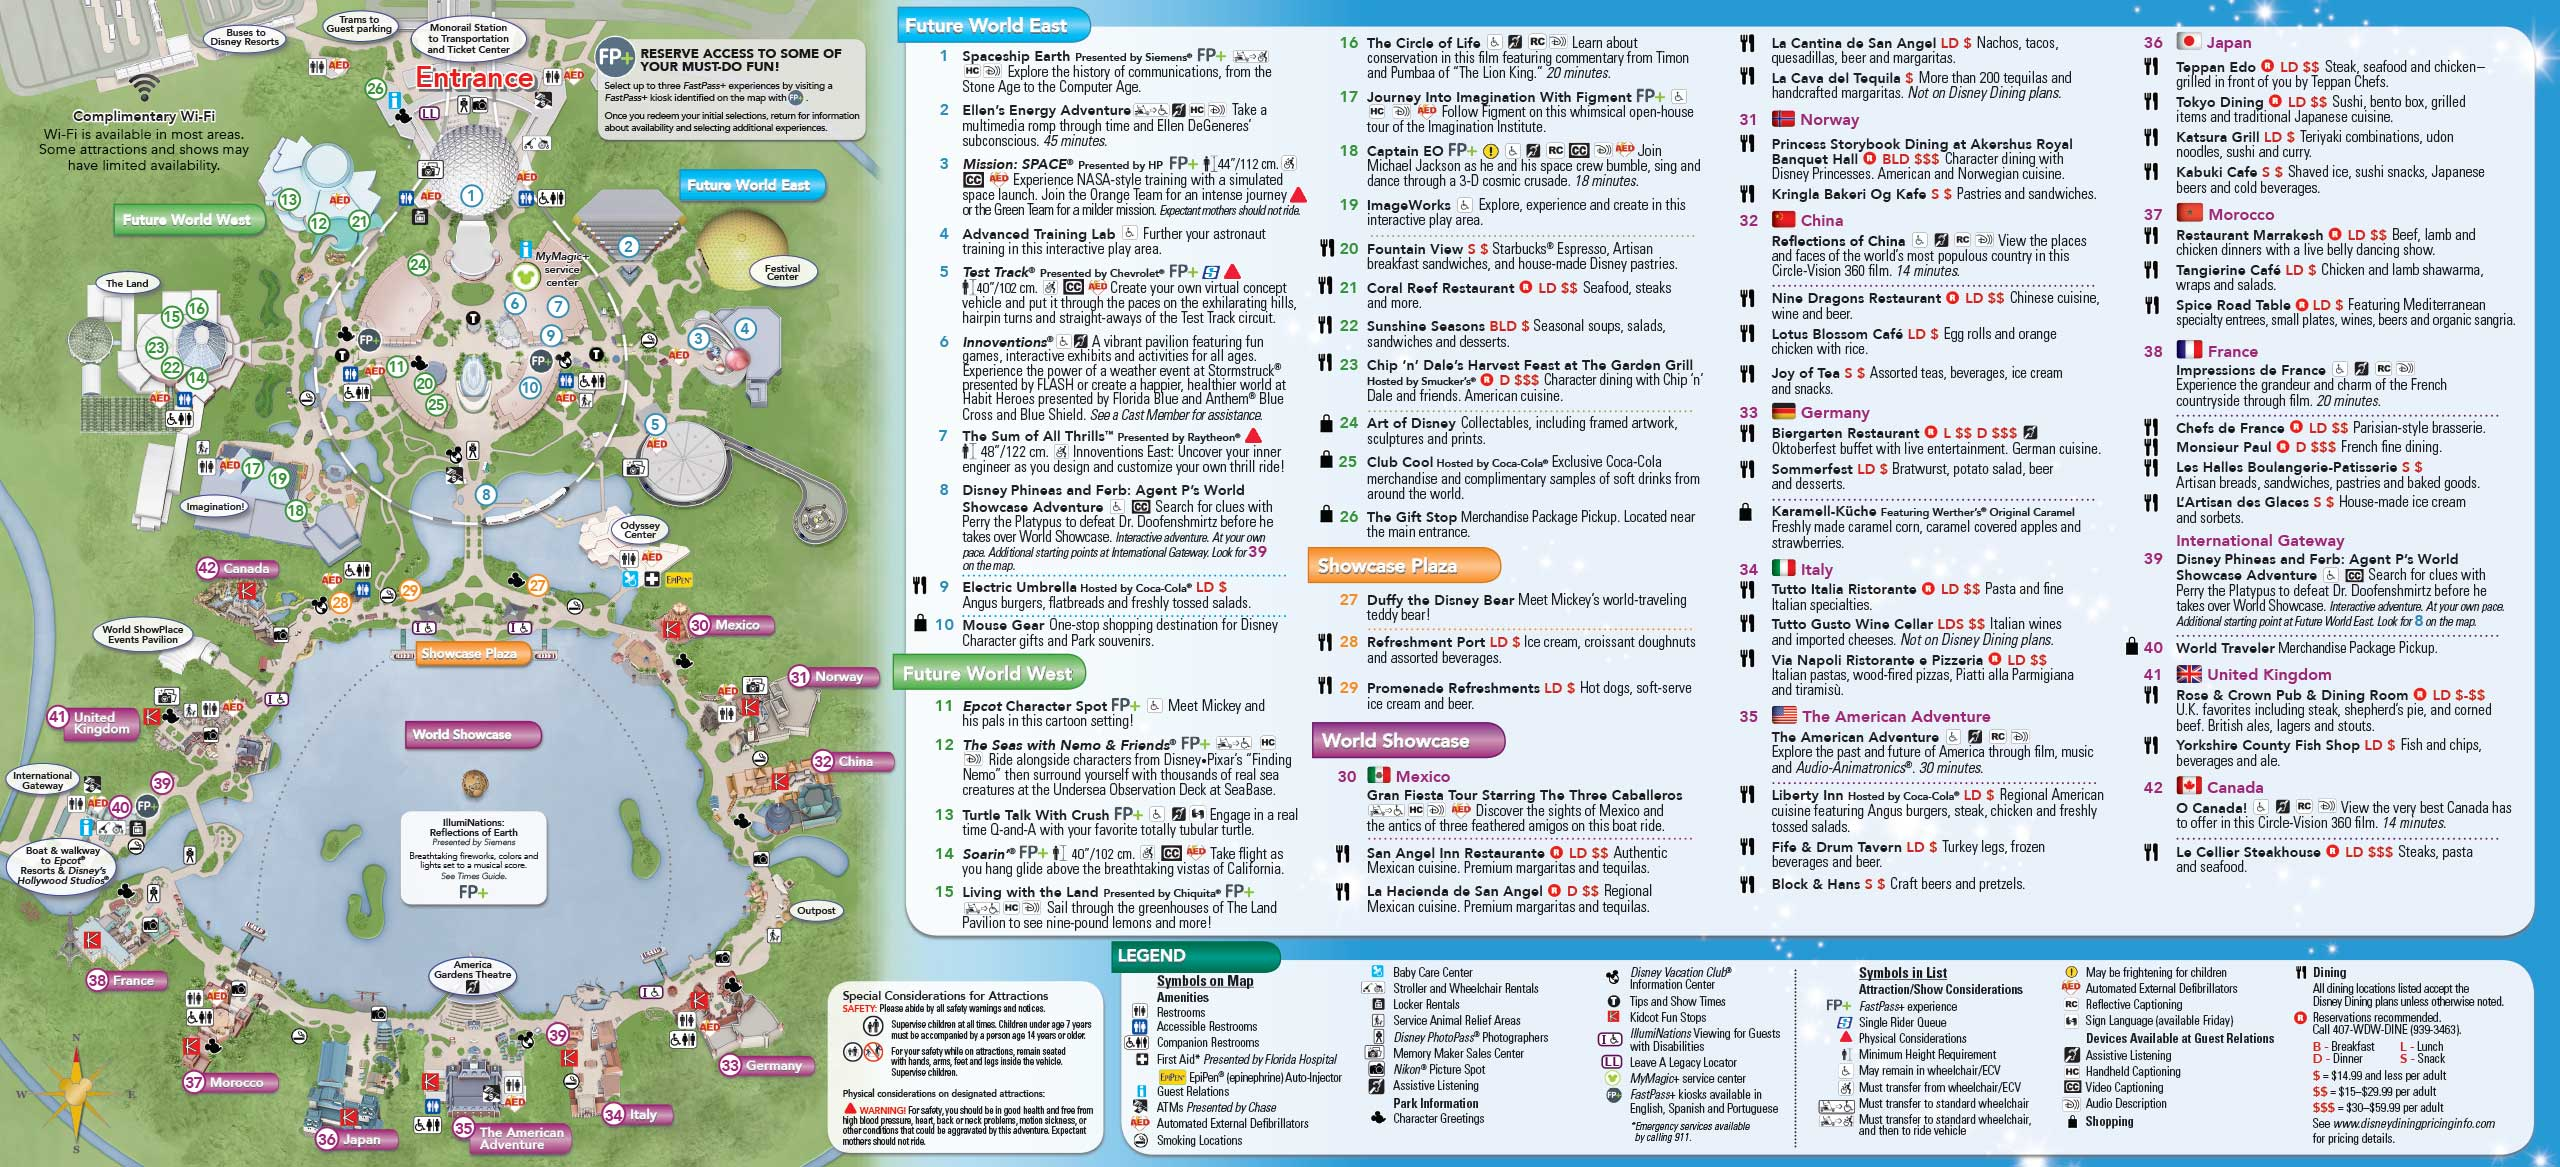 May 2015 walt disney world resort park maps photo 6 of 14 gumiabroncs Images